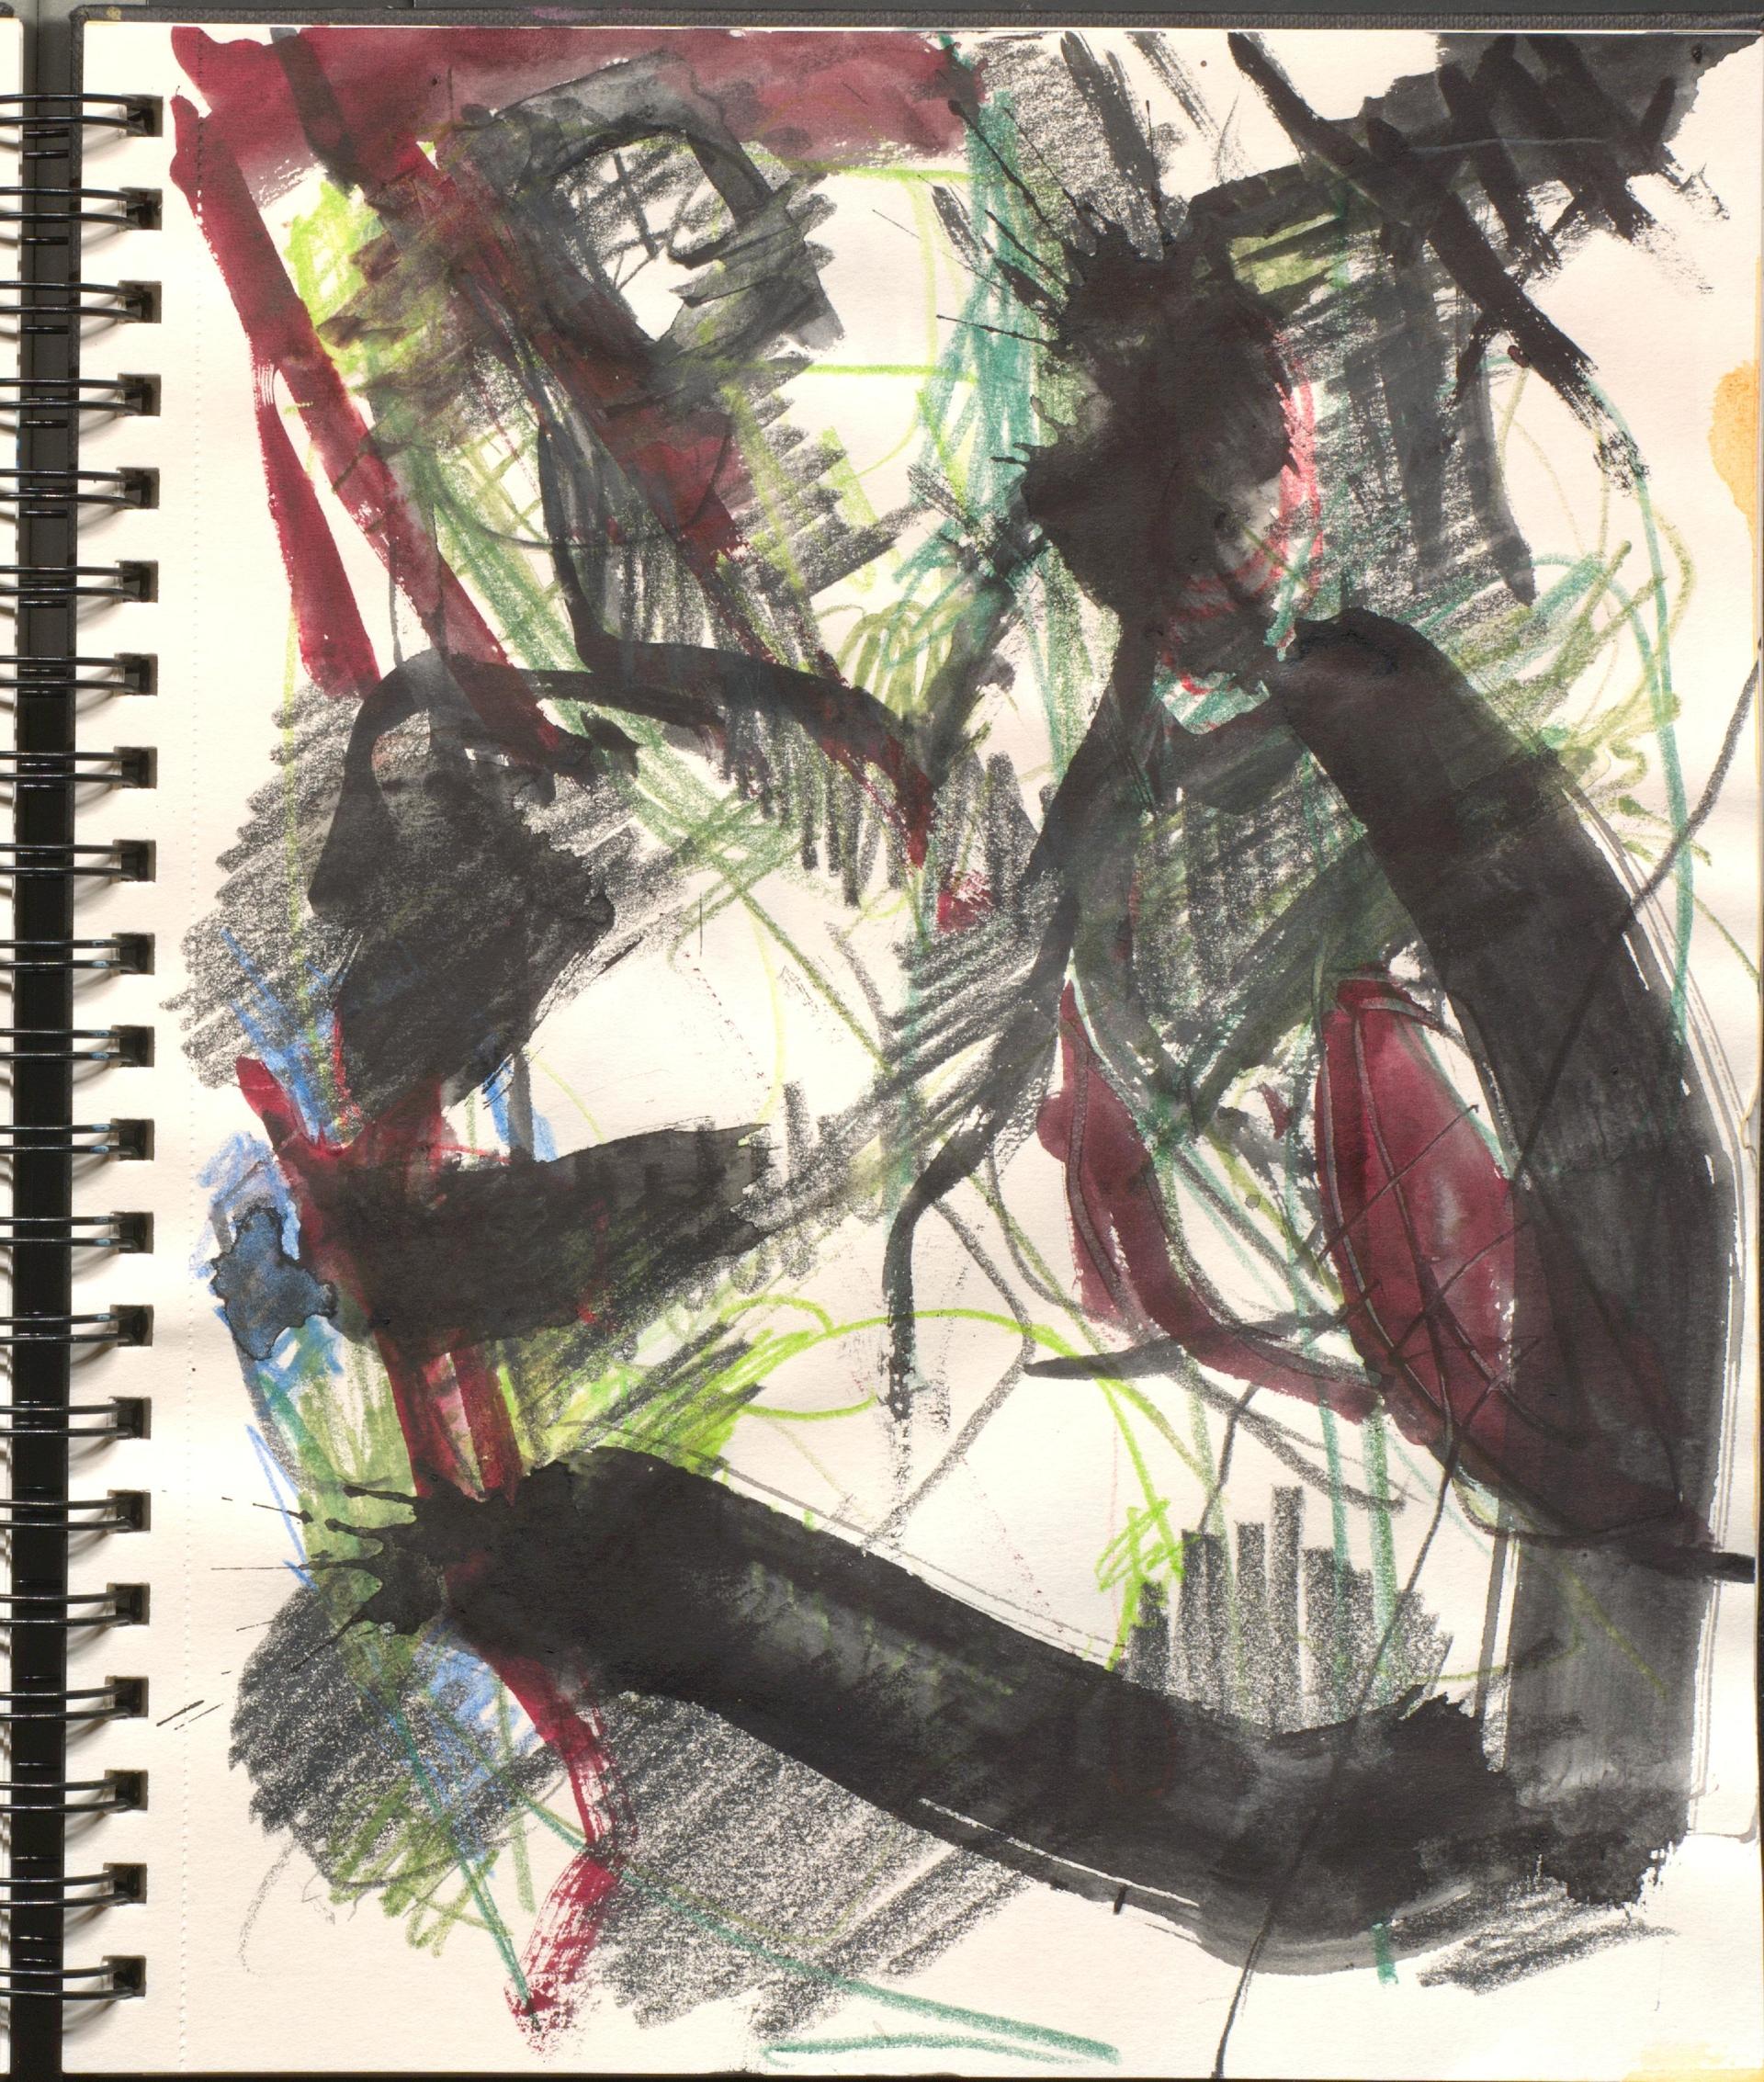 laboratorium haus 1 Heiko Wennesz grafik 3-sketches